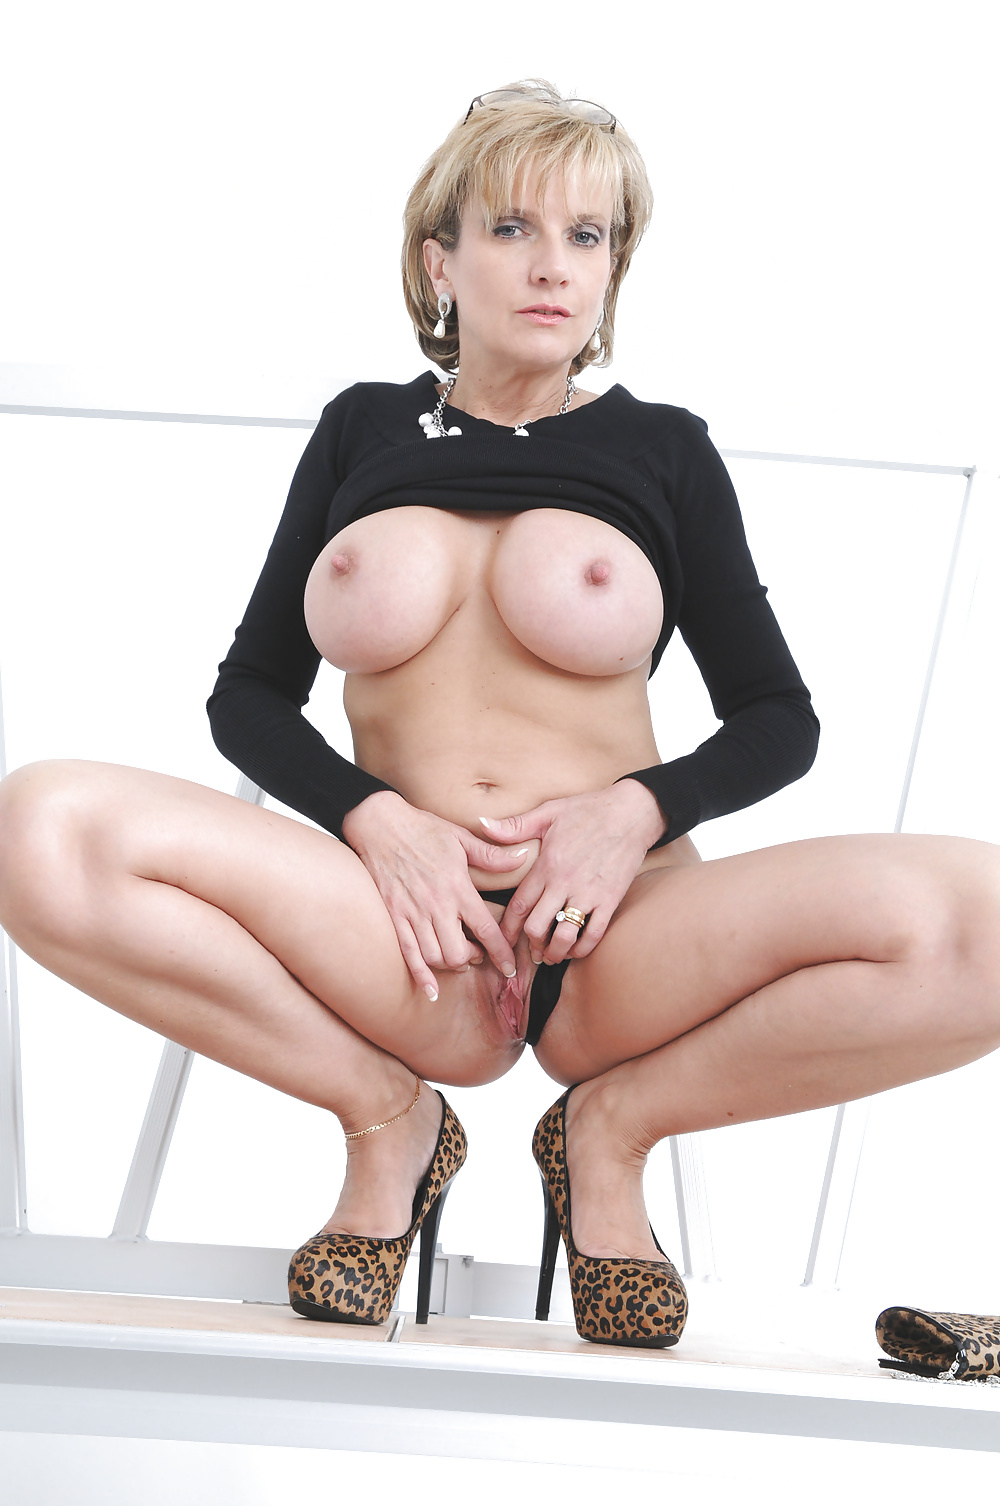 Порно фото леди соня каталог — pic 8